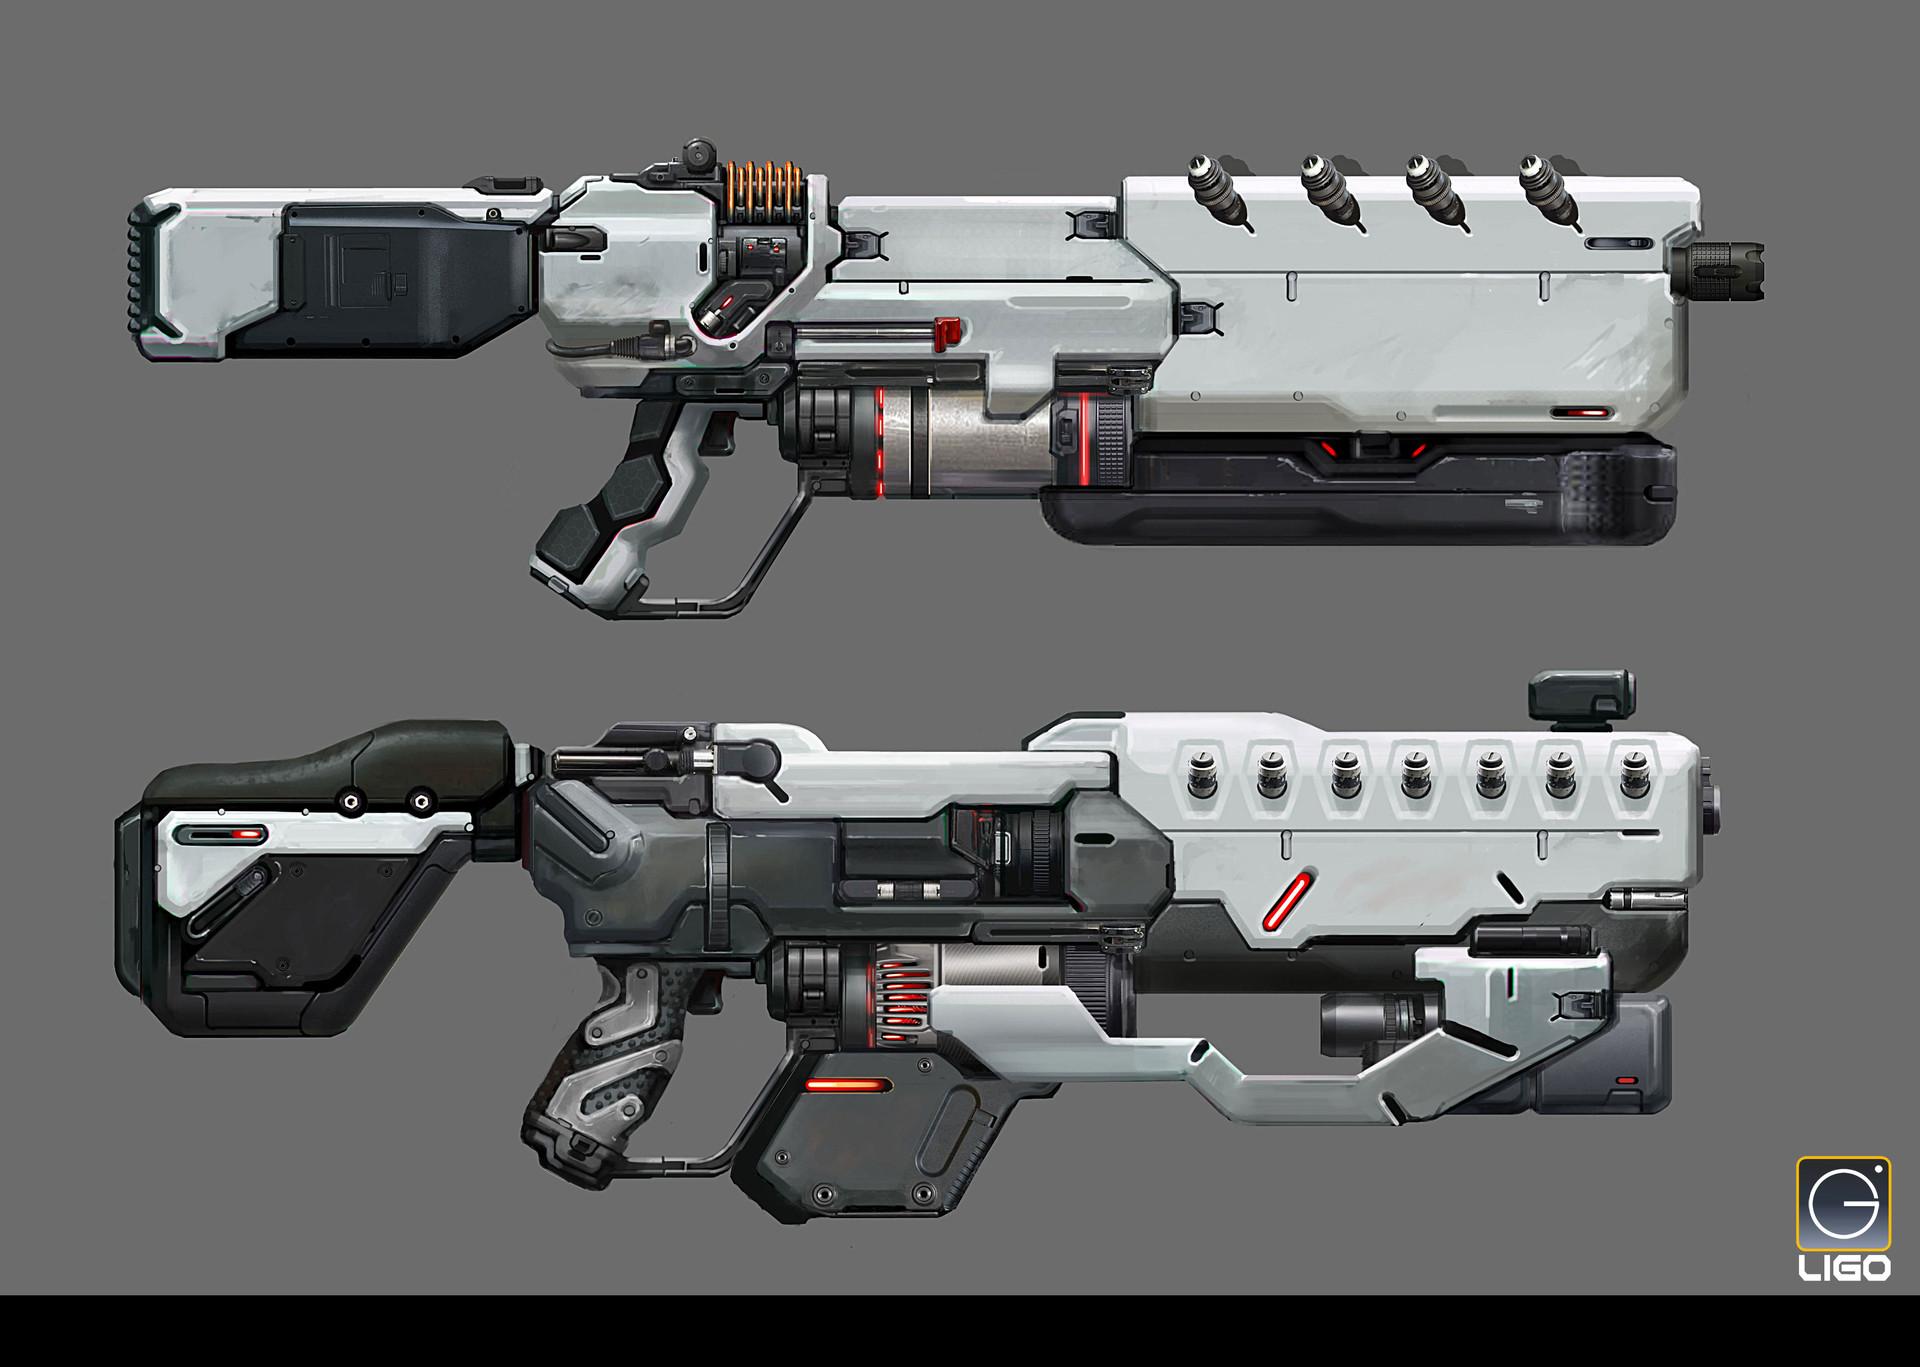 ArtStation - Assault rifle Design for the RISING FIRE, Jay Li